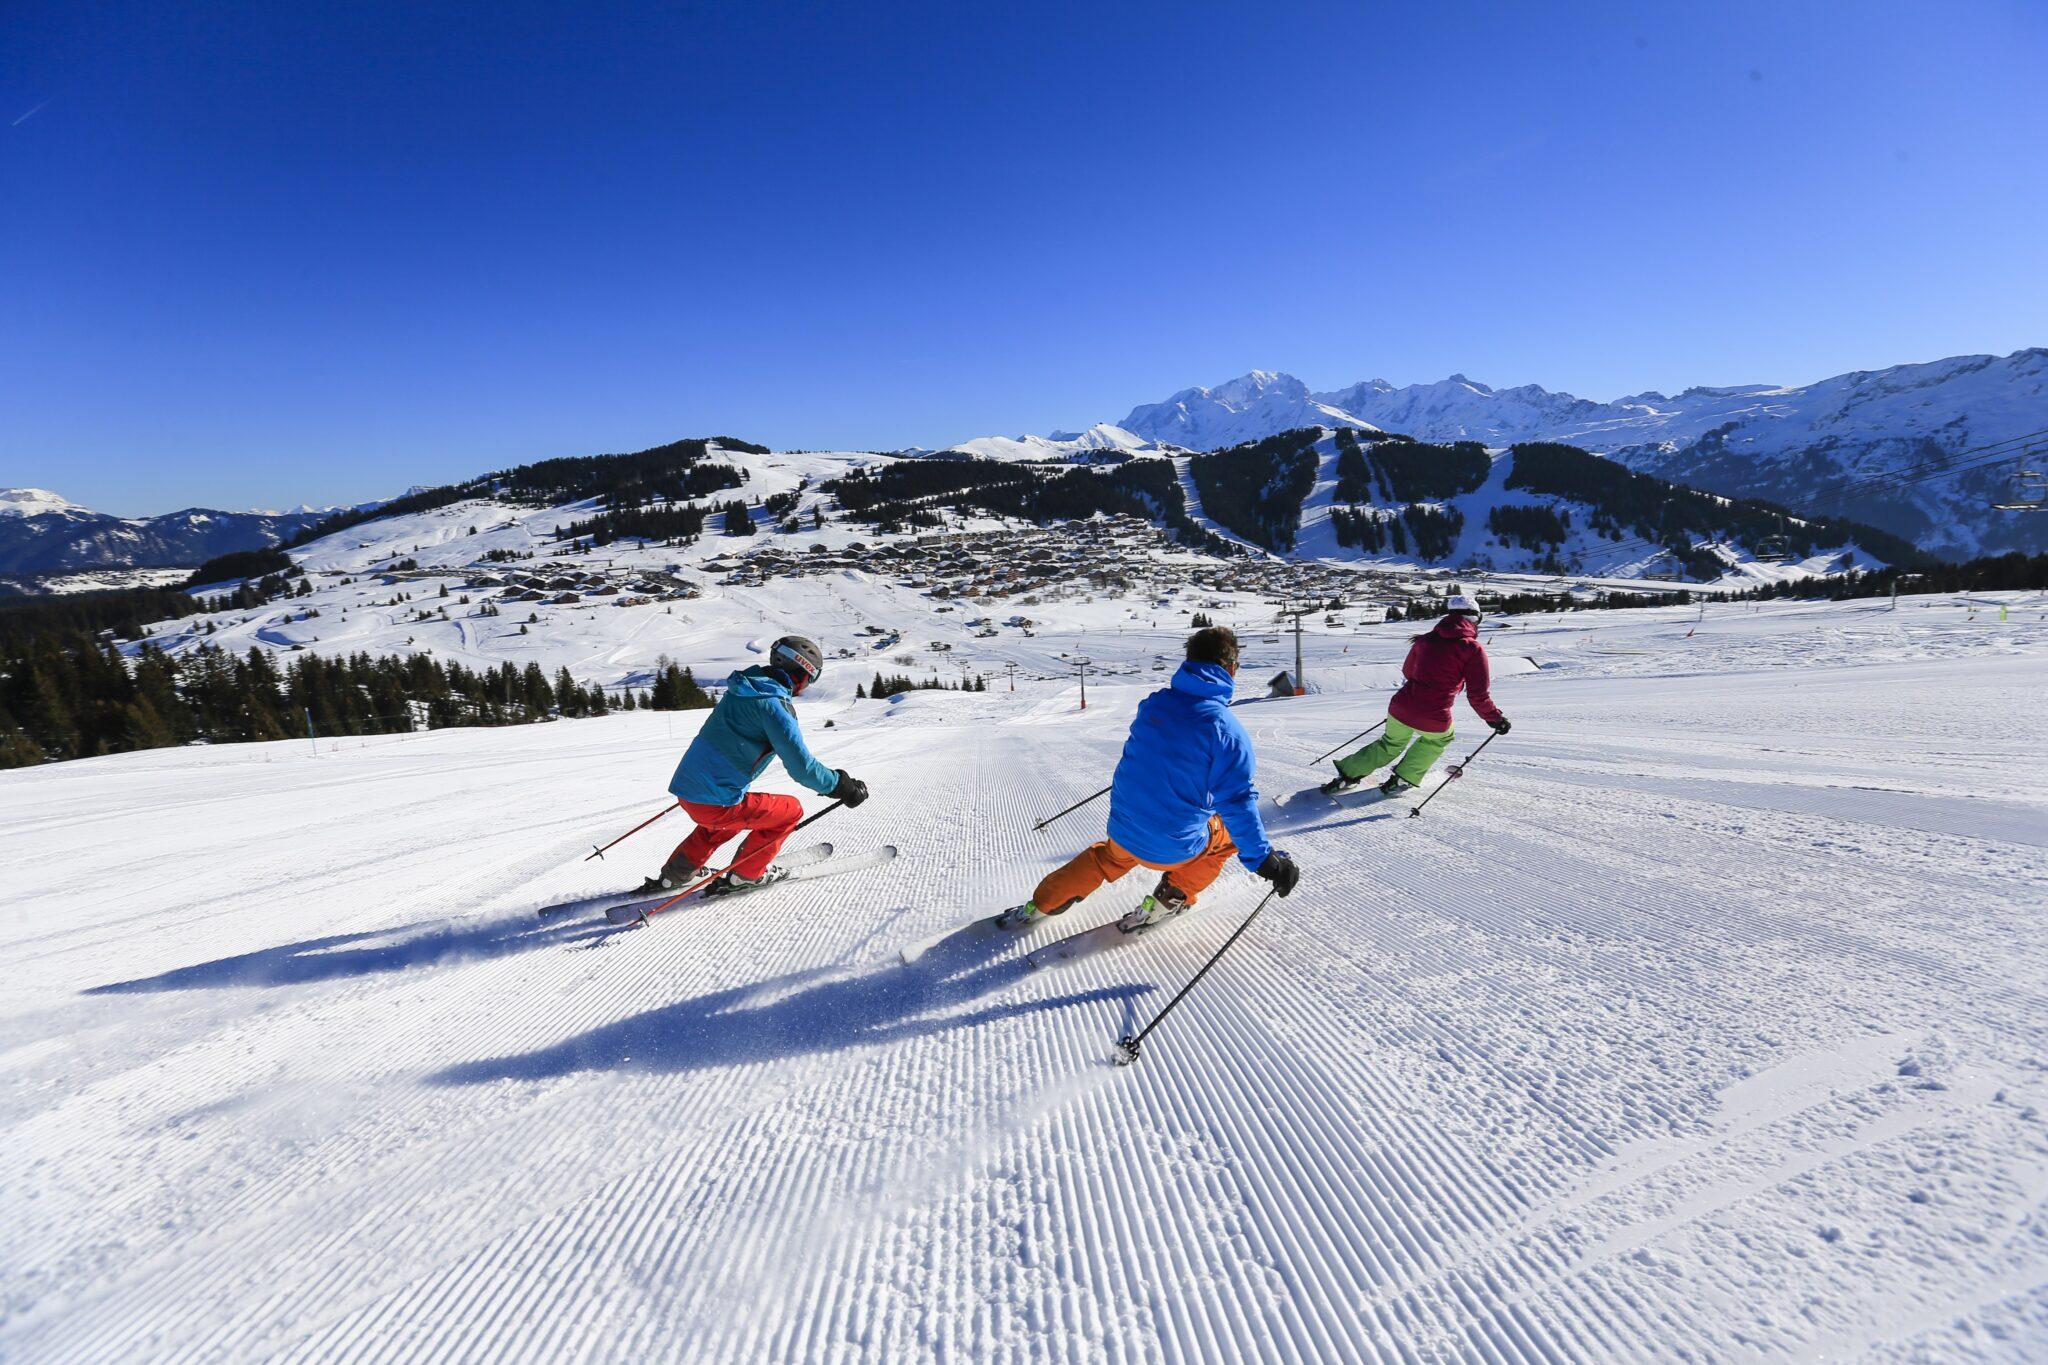 Le domaine skiable des Saisies © Monica Dalmasso